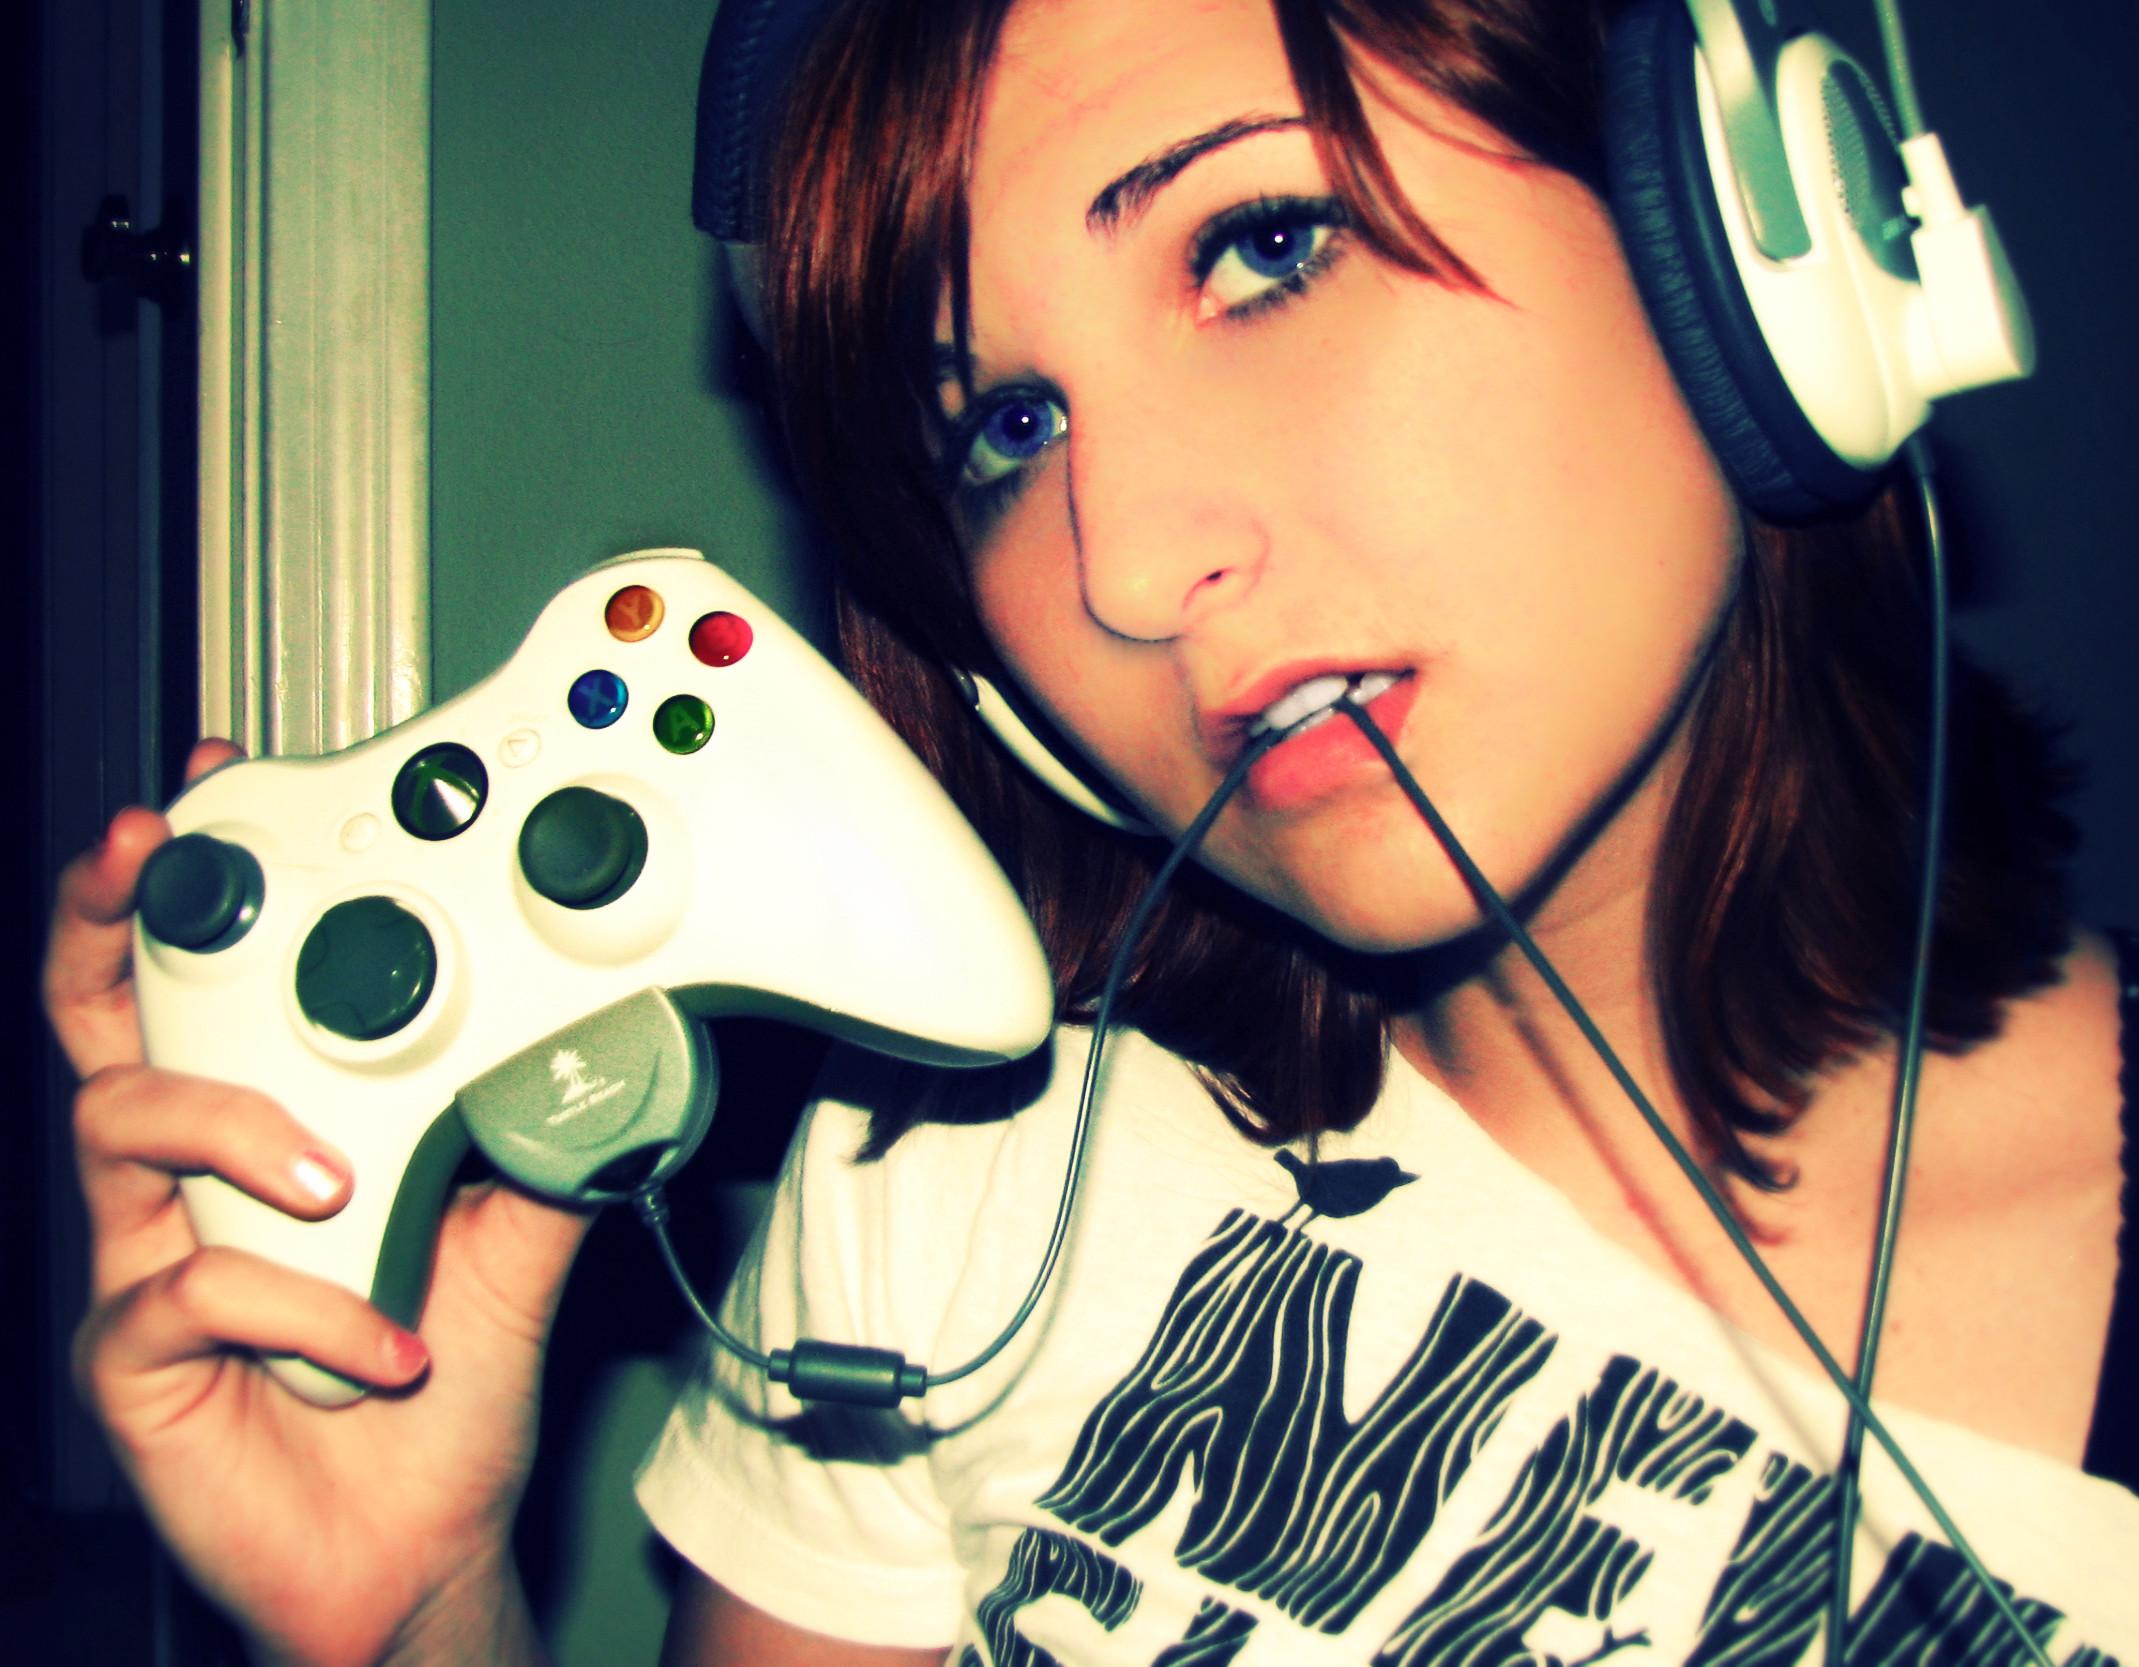 Wish I had a headset like that.